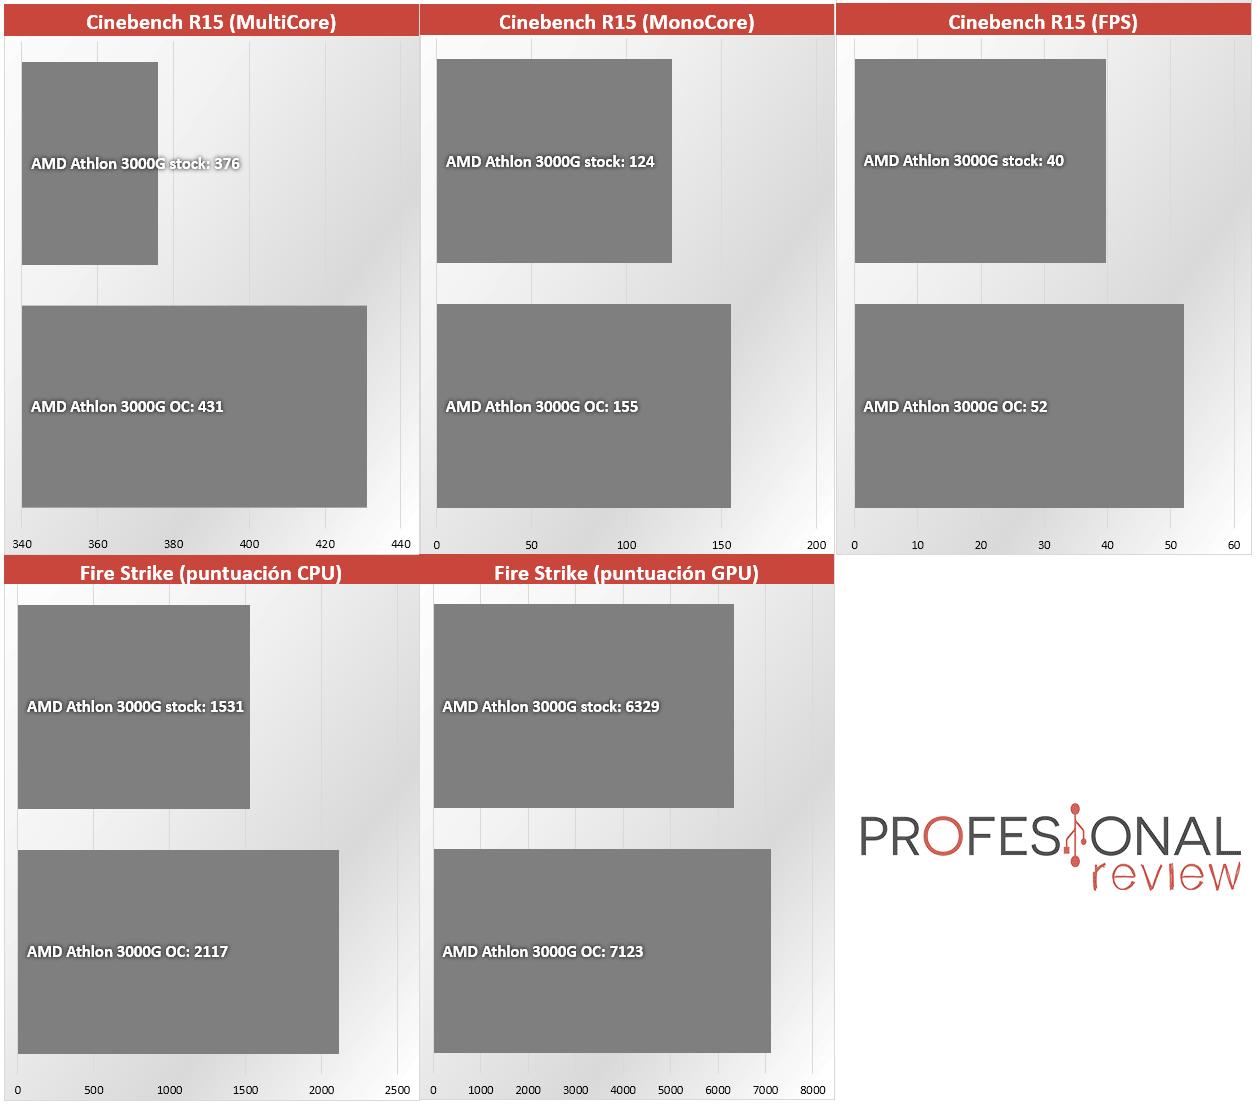 AMD Athlon 3000G Overclocking